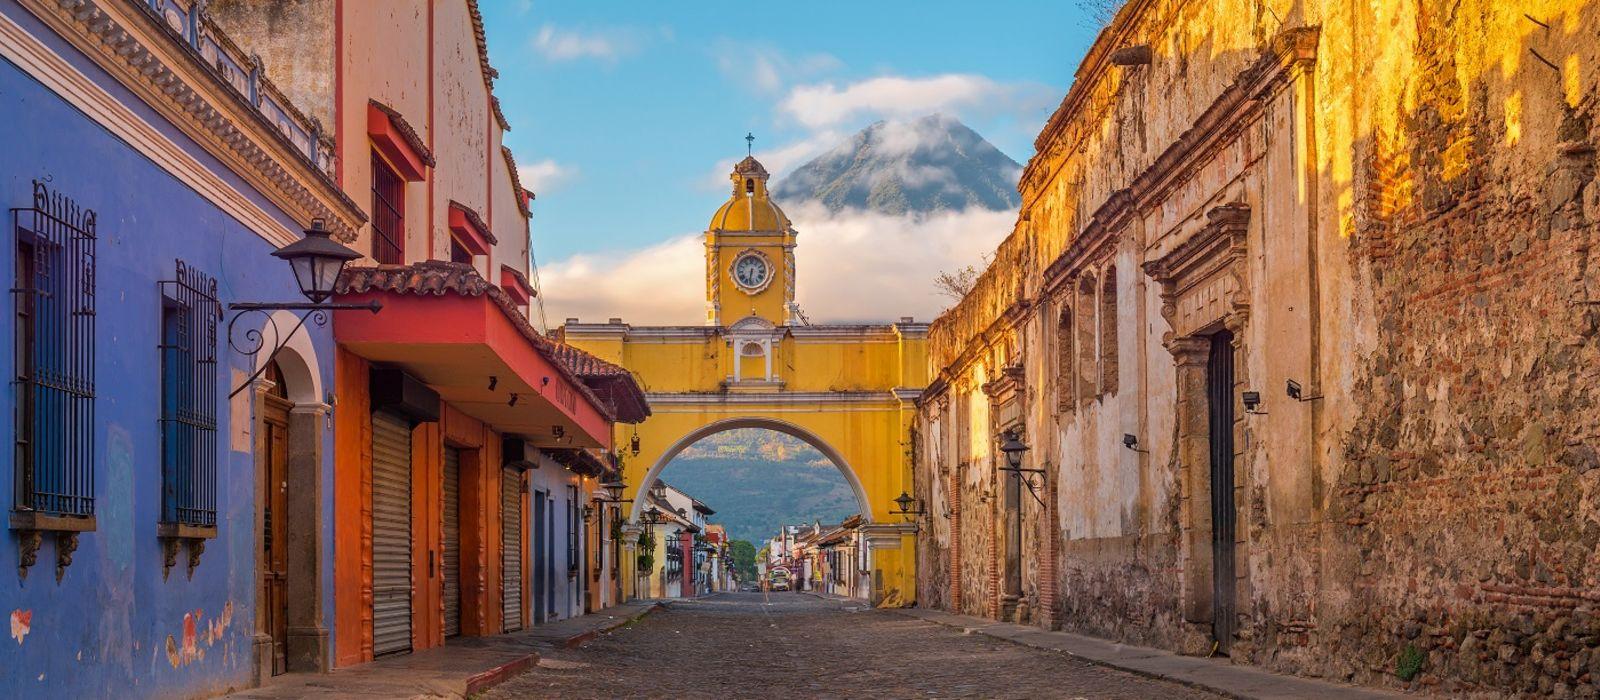 Volcano Trekking in Guatemala Tour Trip 6